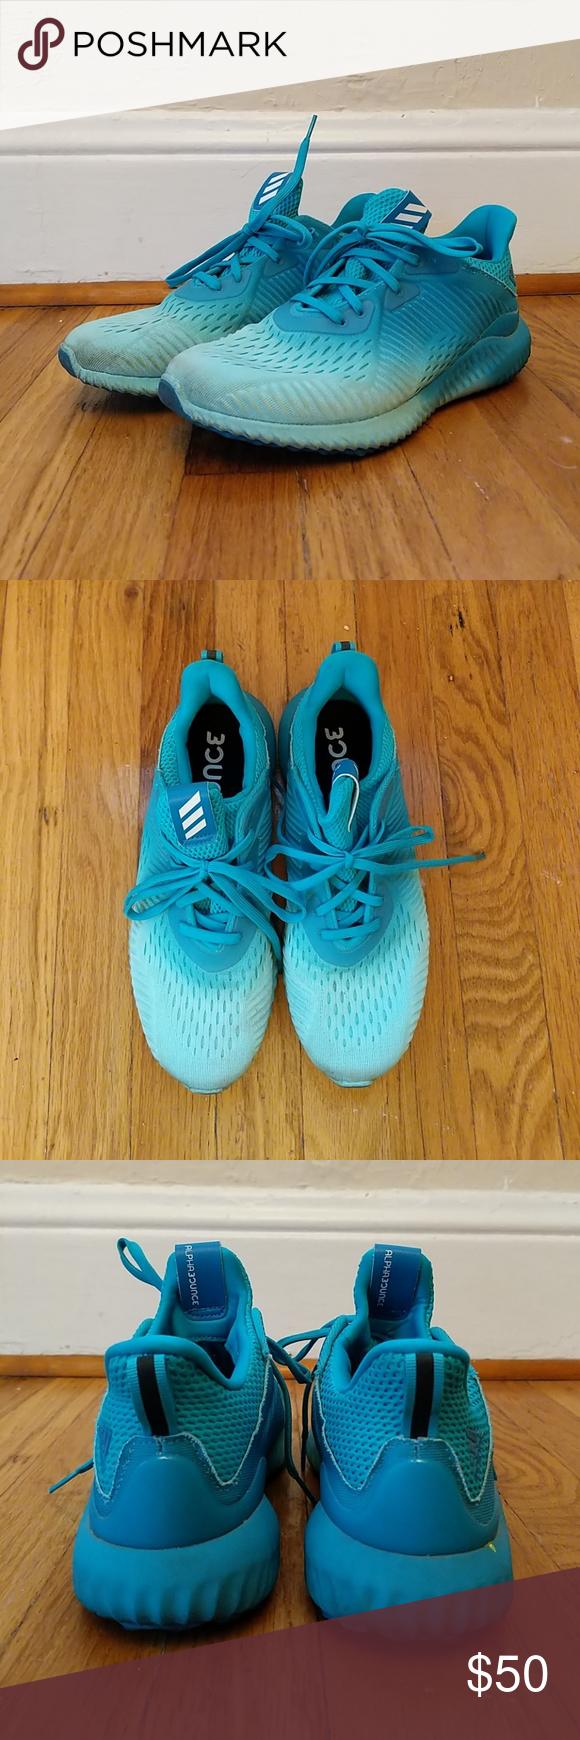 Women Shoes Sepatu